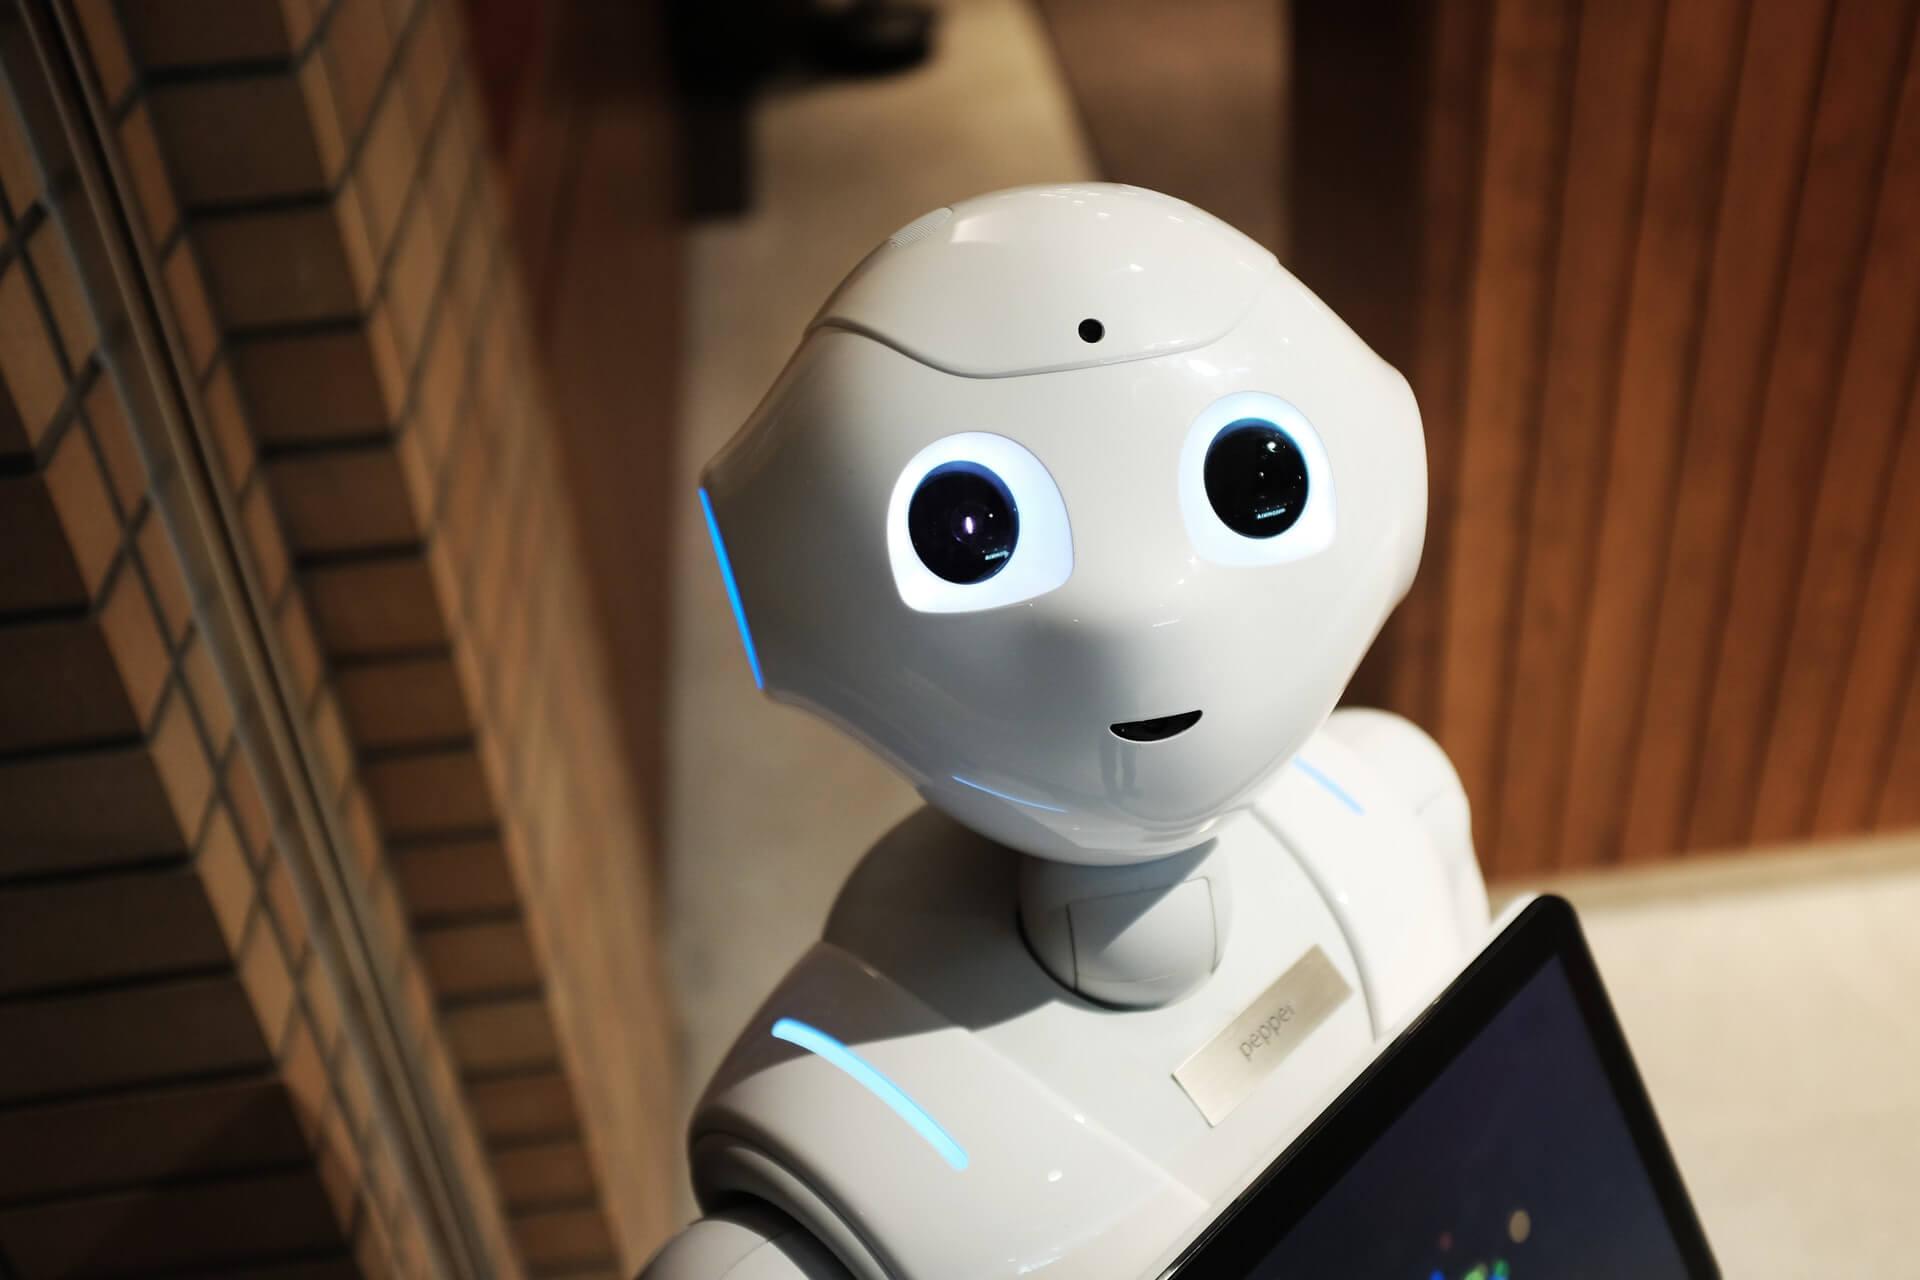 White robot looking at camera